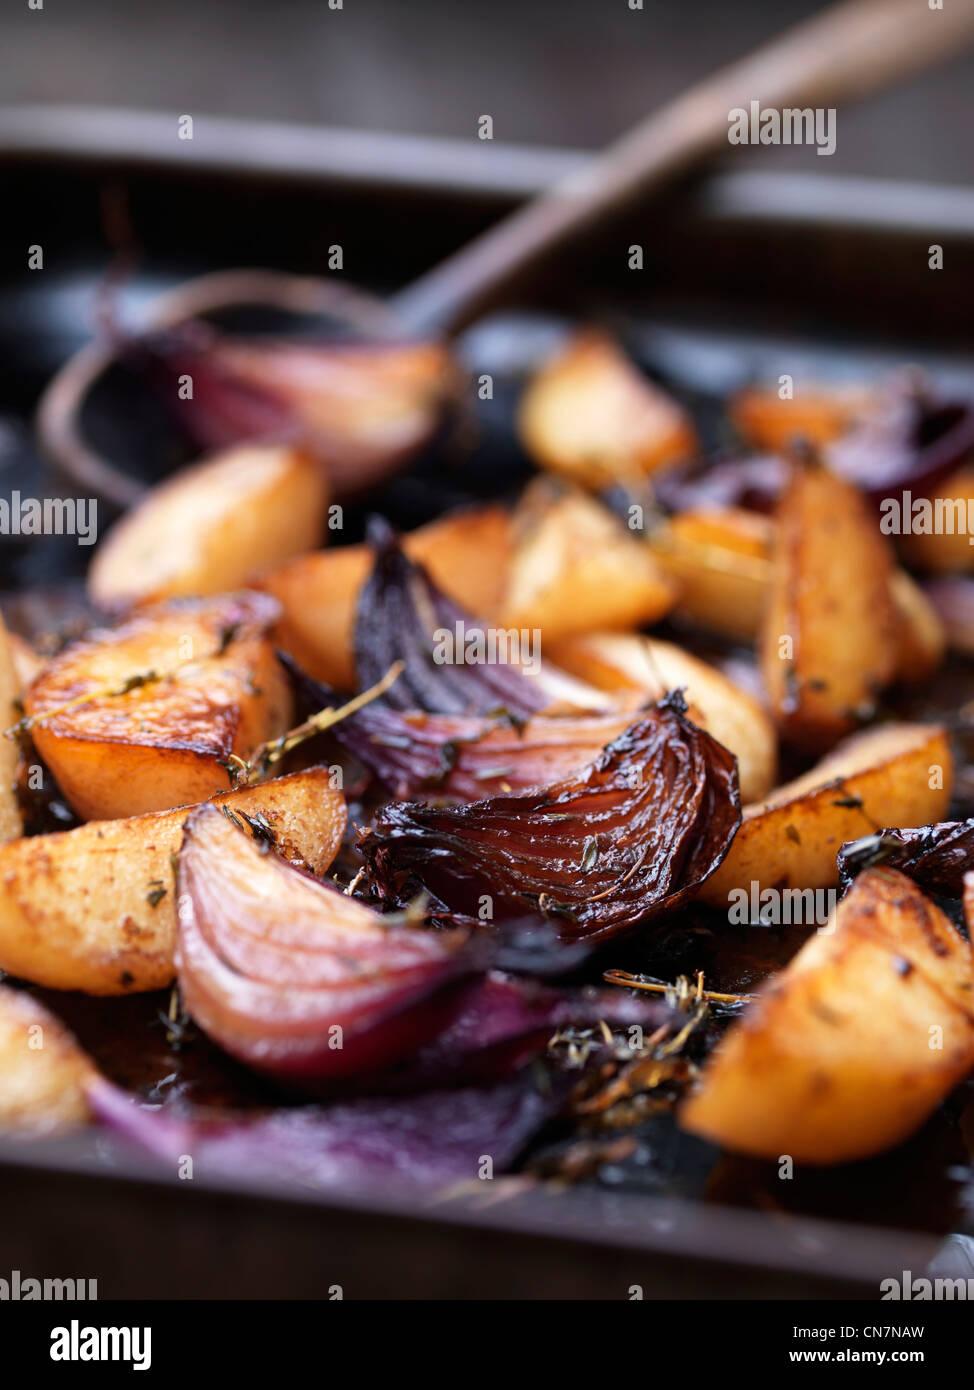 Nahaufnahme von gebratenem Gemüse im tray Stockbild